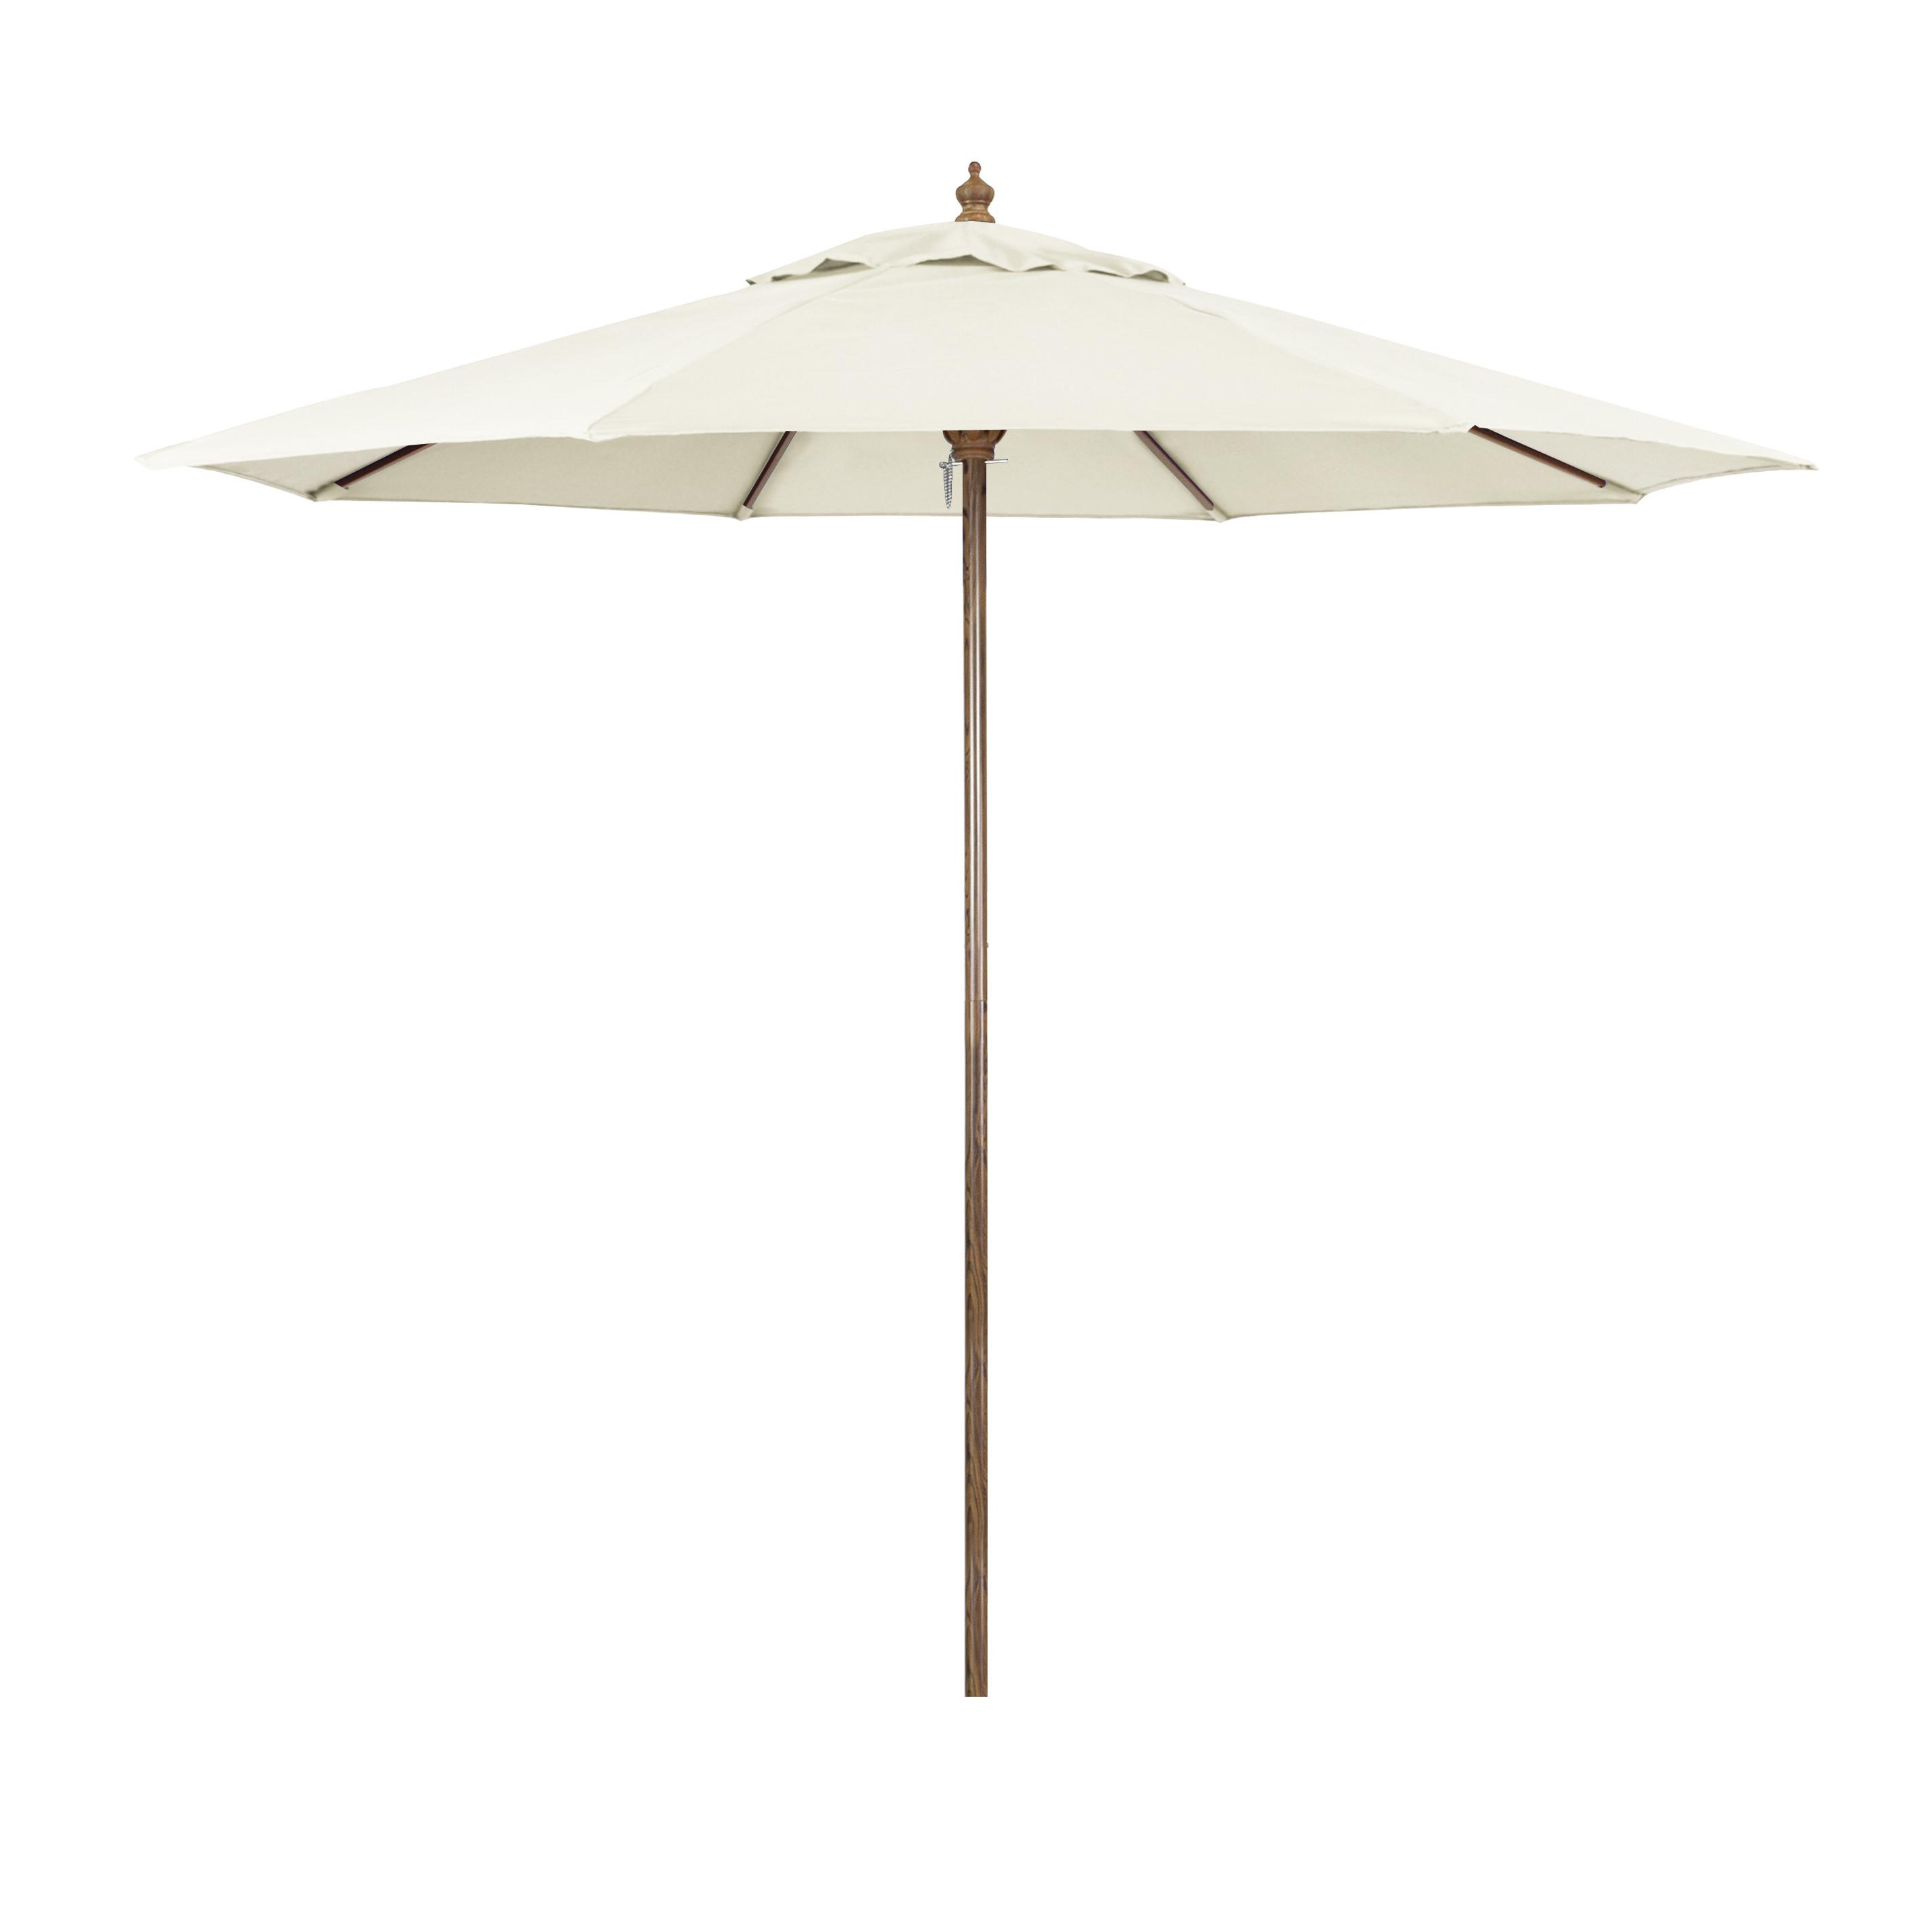 Jericho Market Umbrellas For Current Ryant 9' Market Umbrella (Gallery 13 of 20)